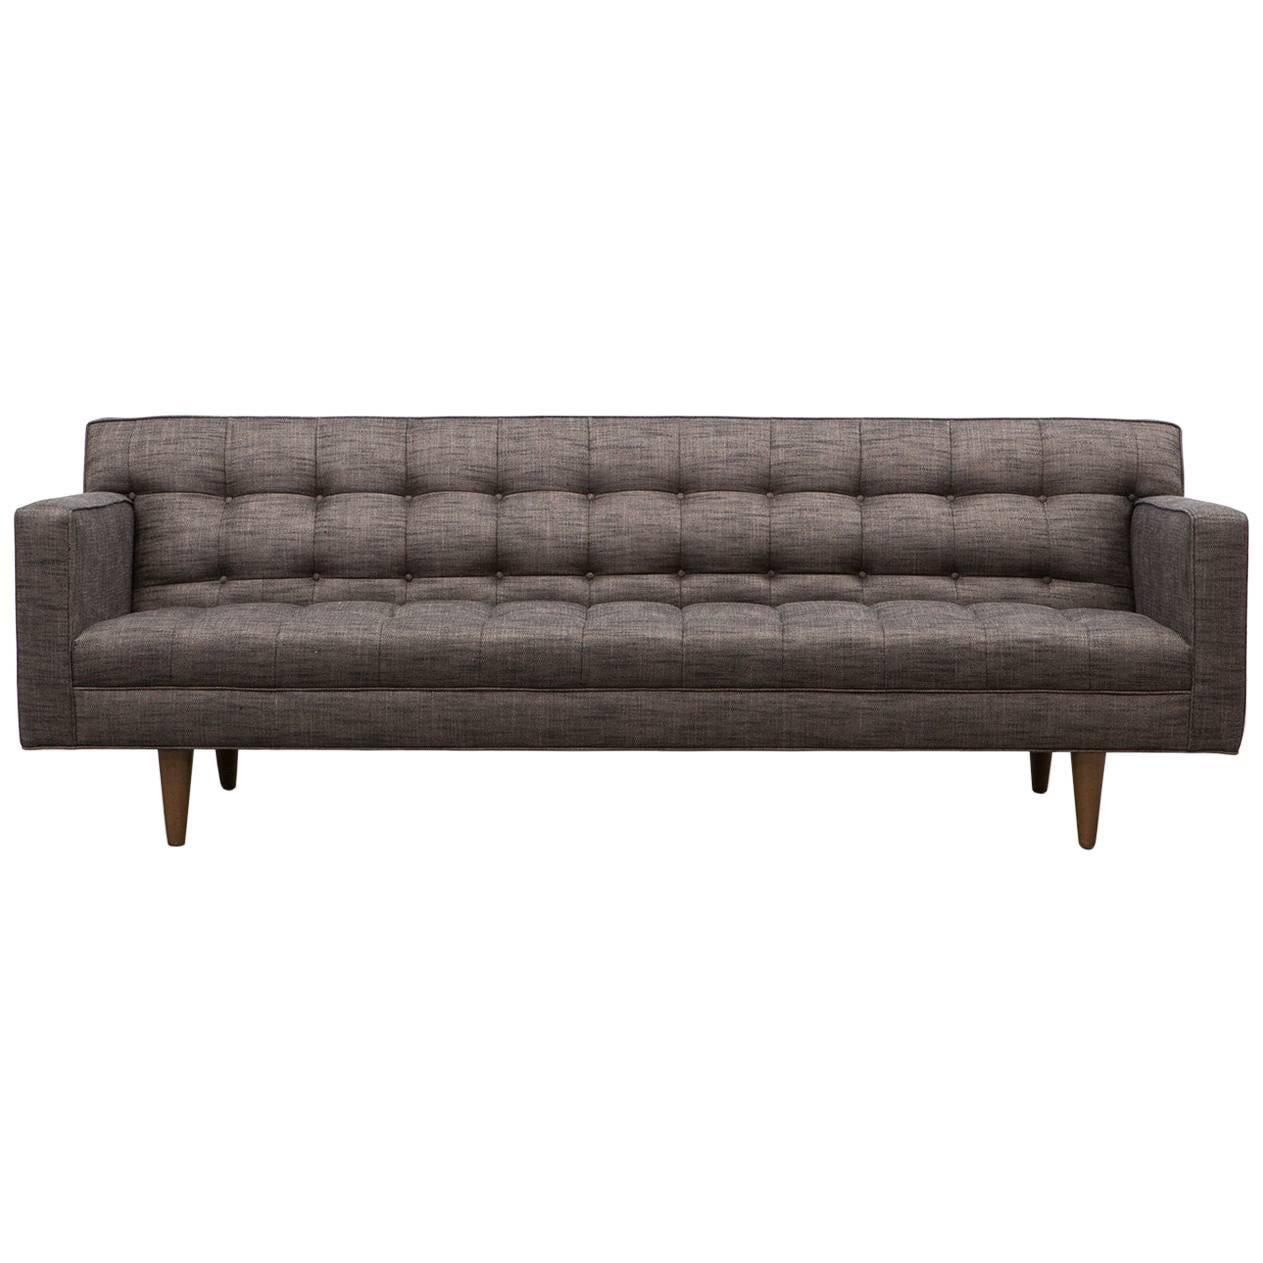 Charming Edward Wormley Sofa U0027bu0027 New Upholstery